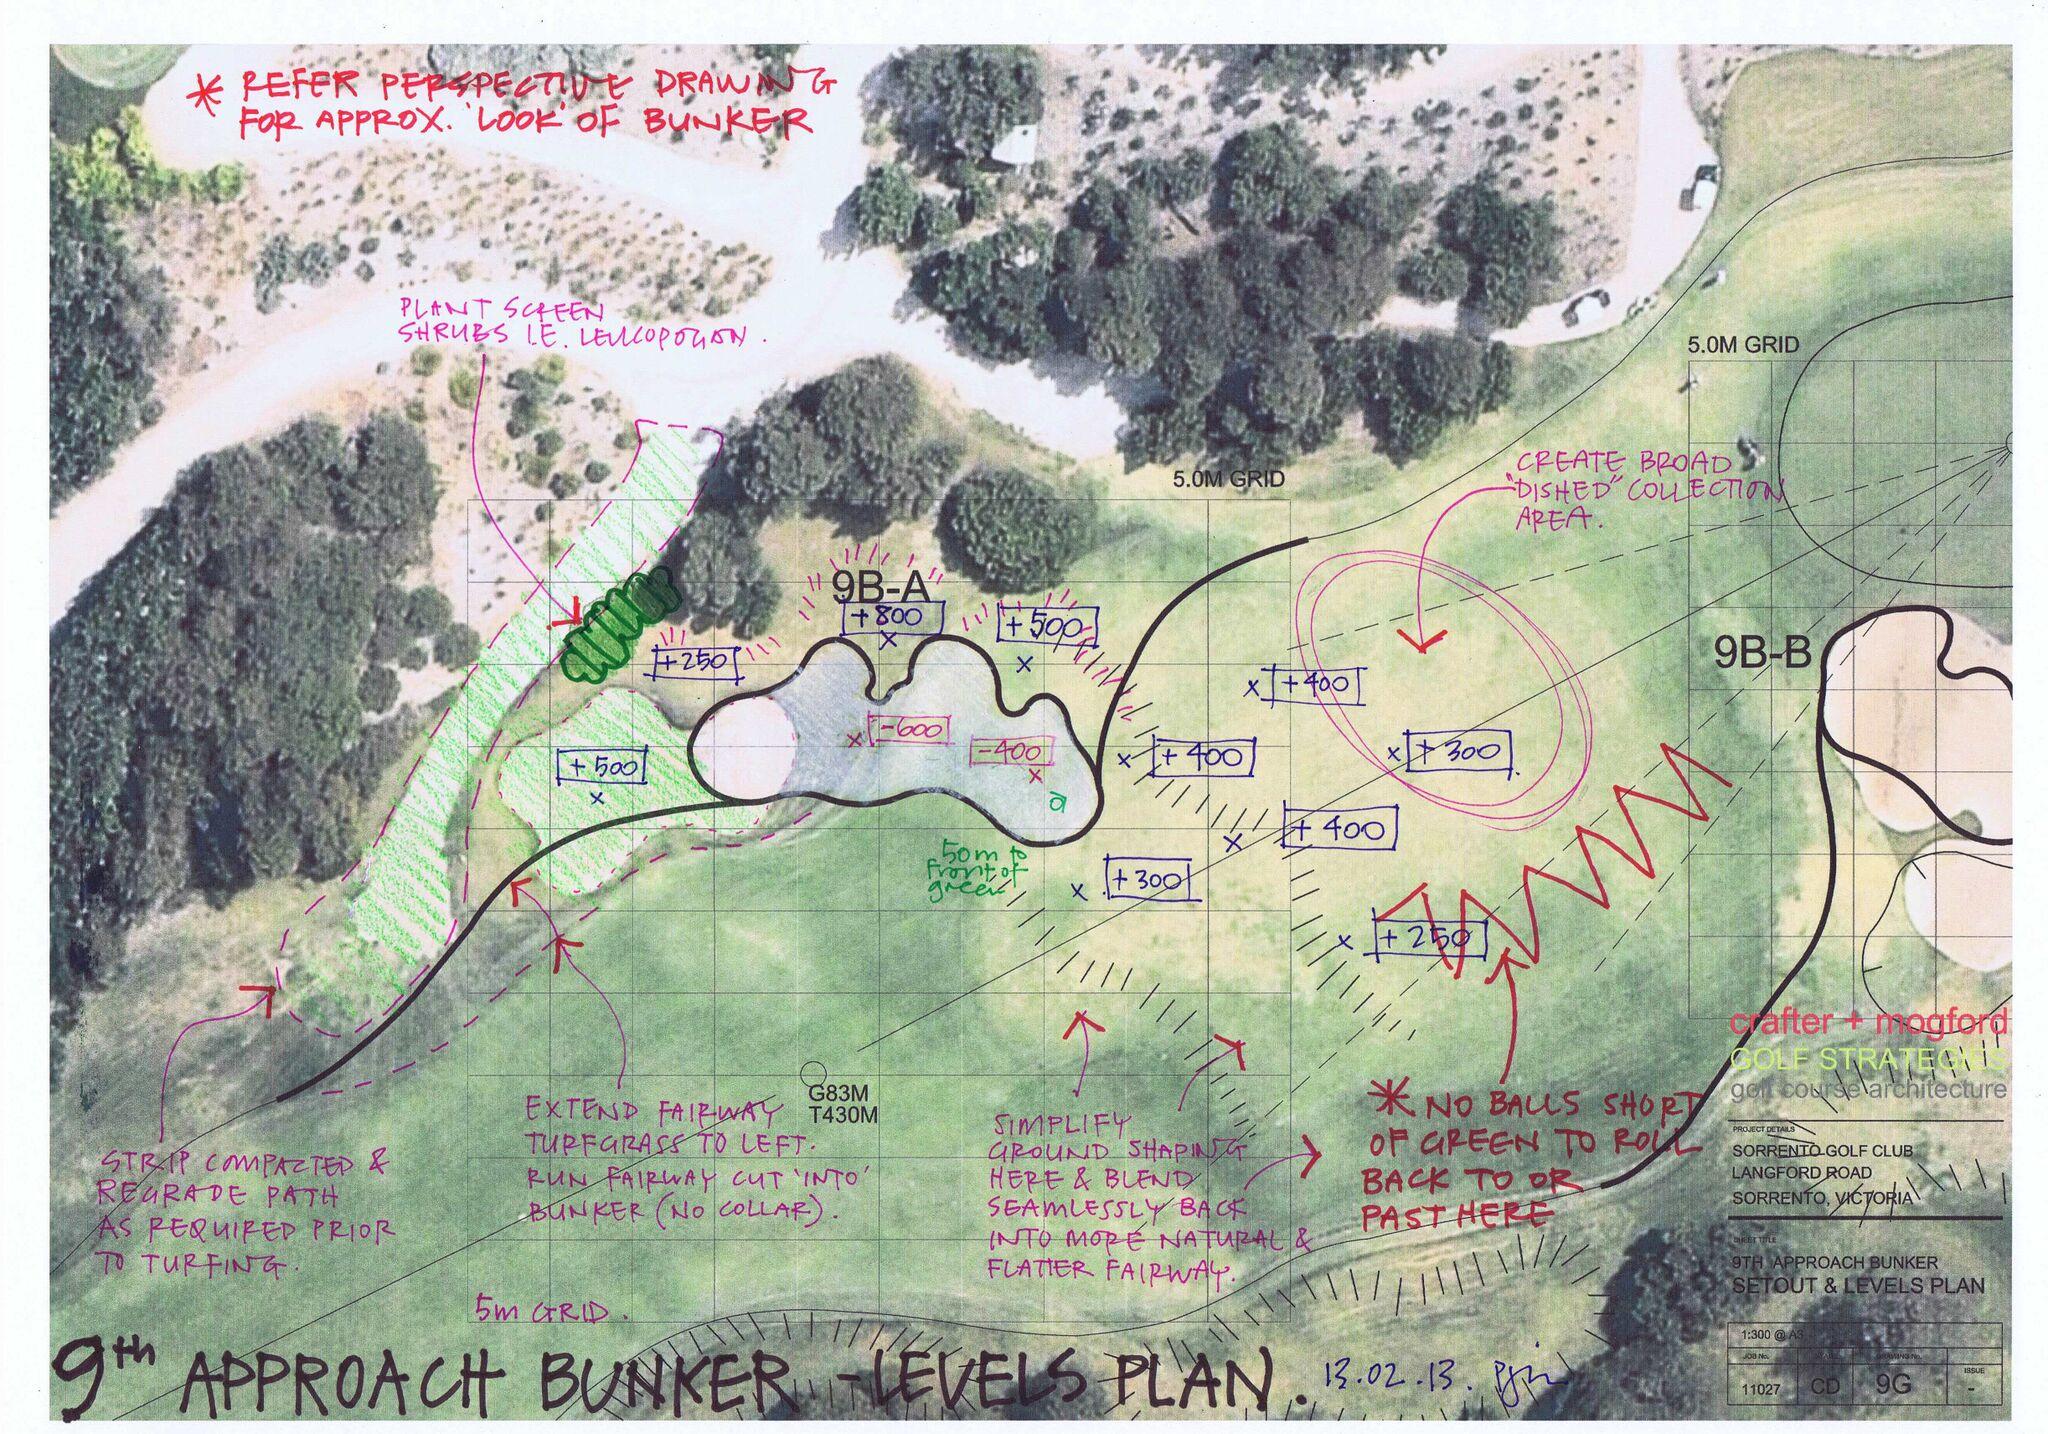 9th approach bunker levels plan.jpeg